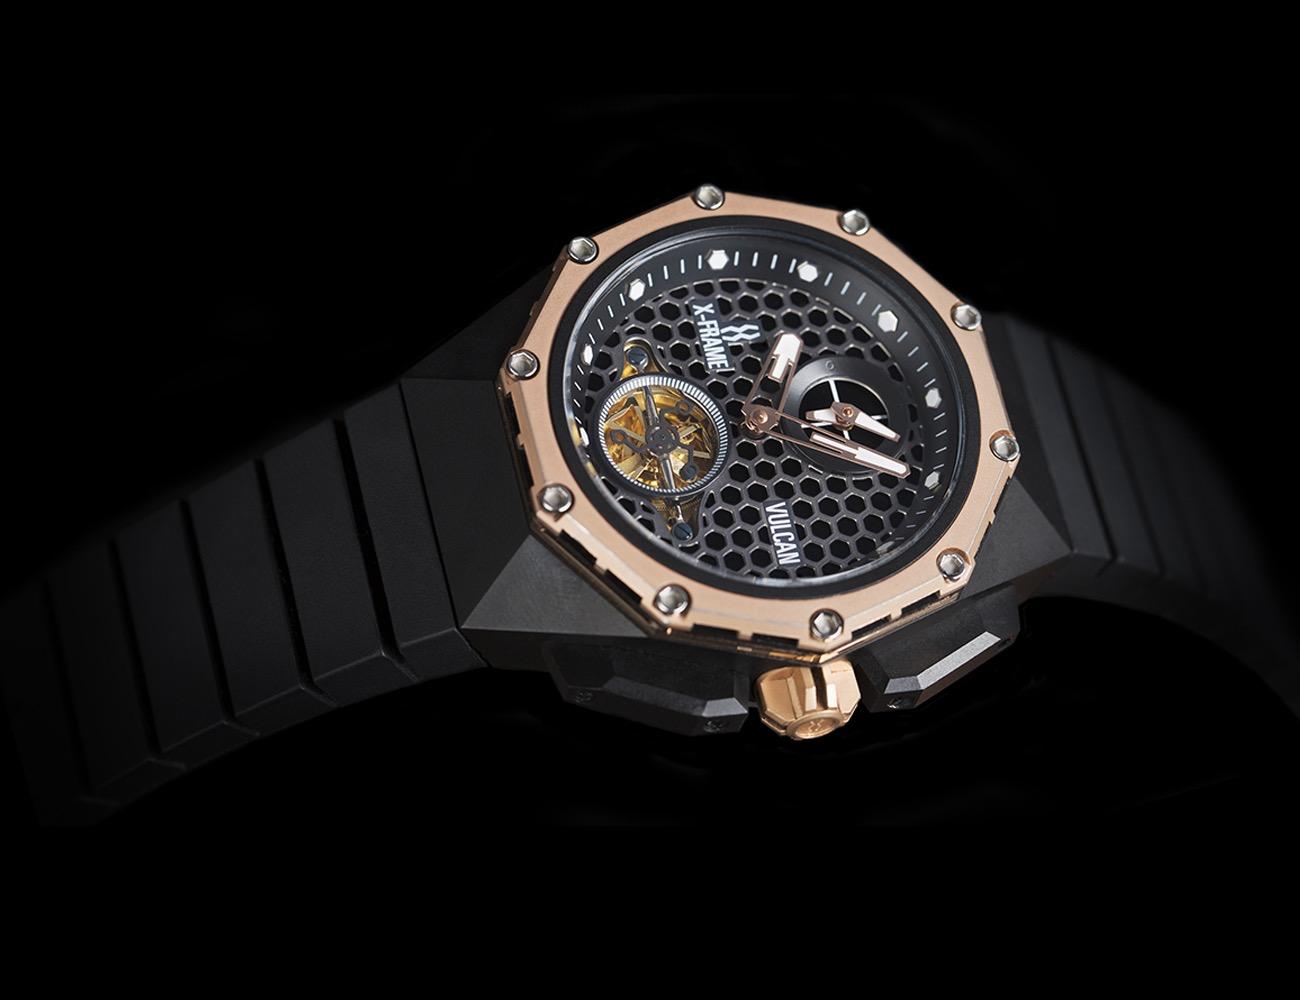 The X-Frame Mechanical Watch